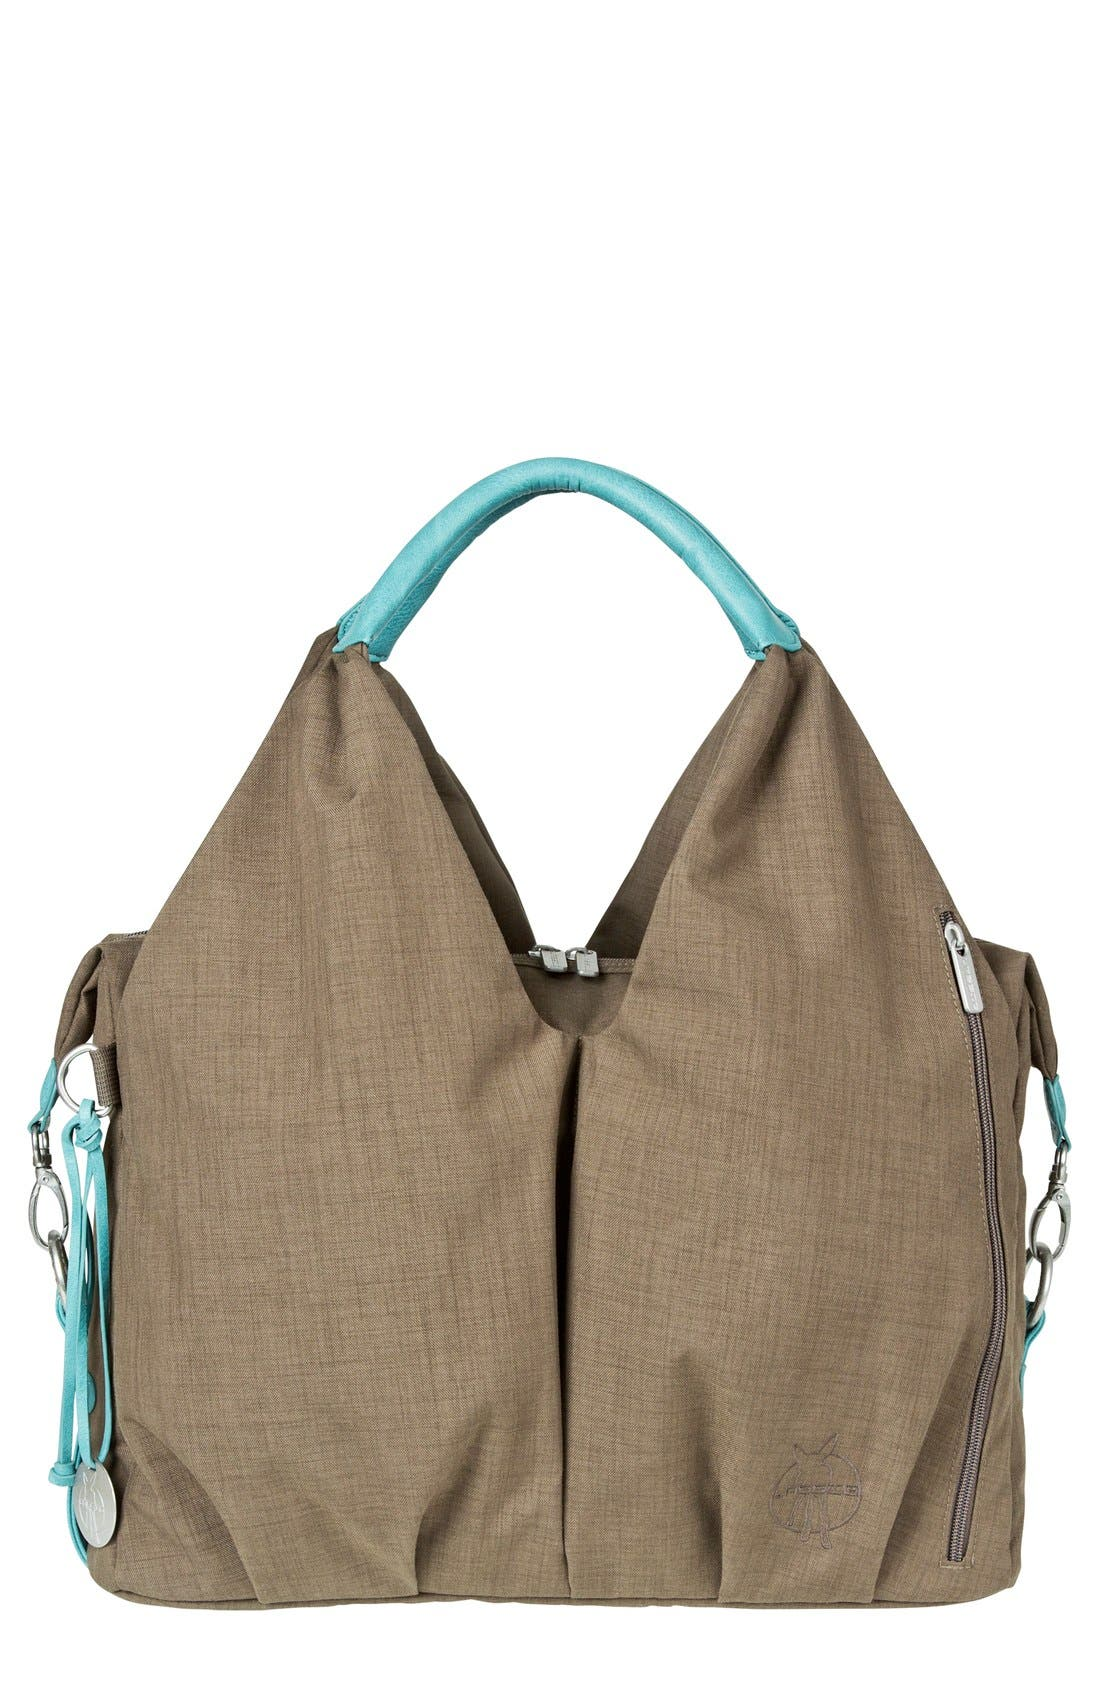 'Green Label - Neckline' Diaper Bag,                             Main thumbnail 1, color,                             Teal/ Brown